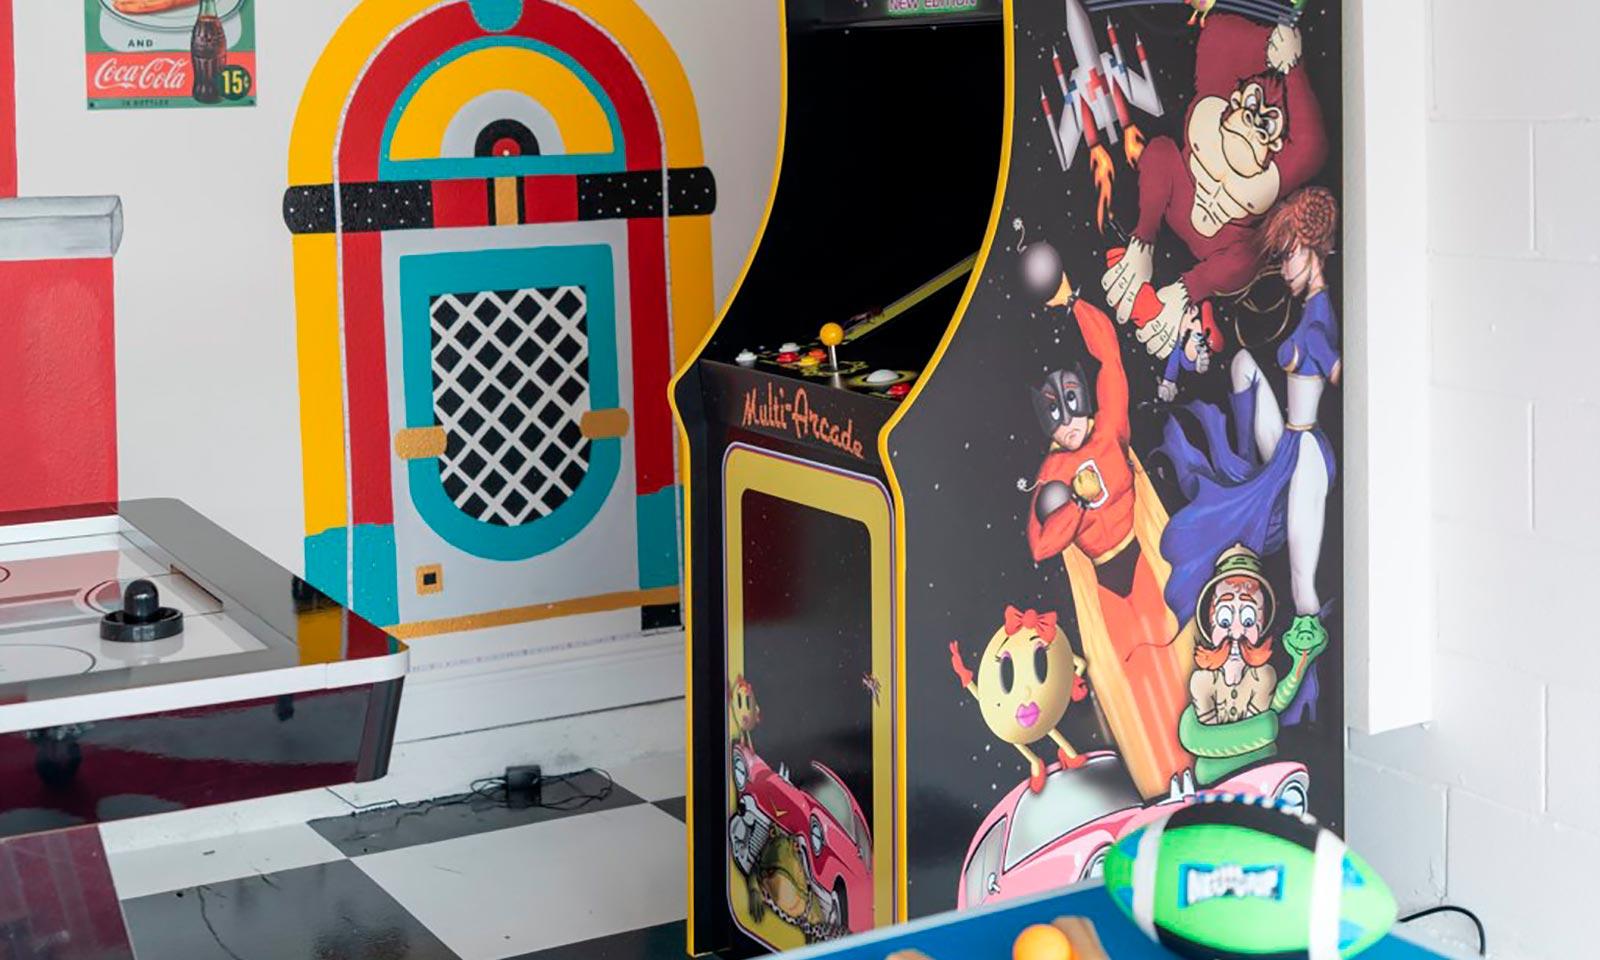 [amenities:arcade-game:3] Arcade Game